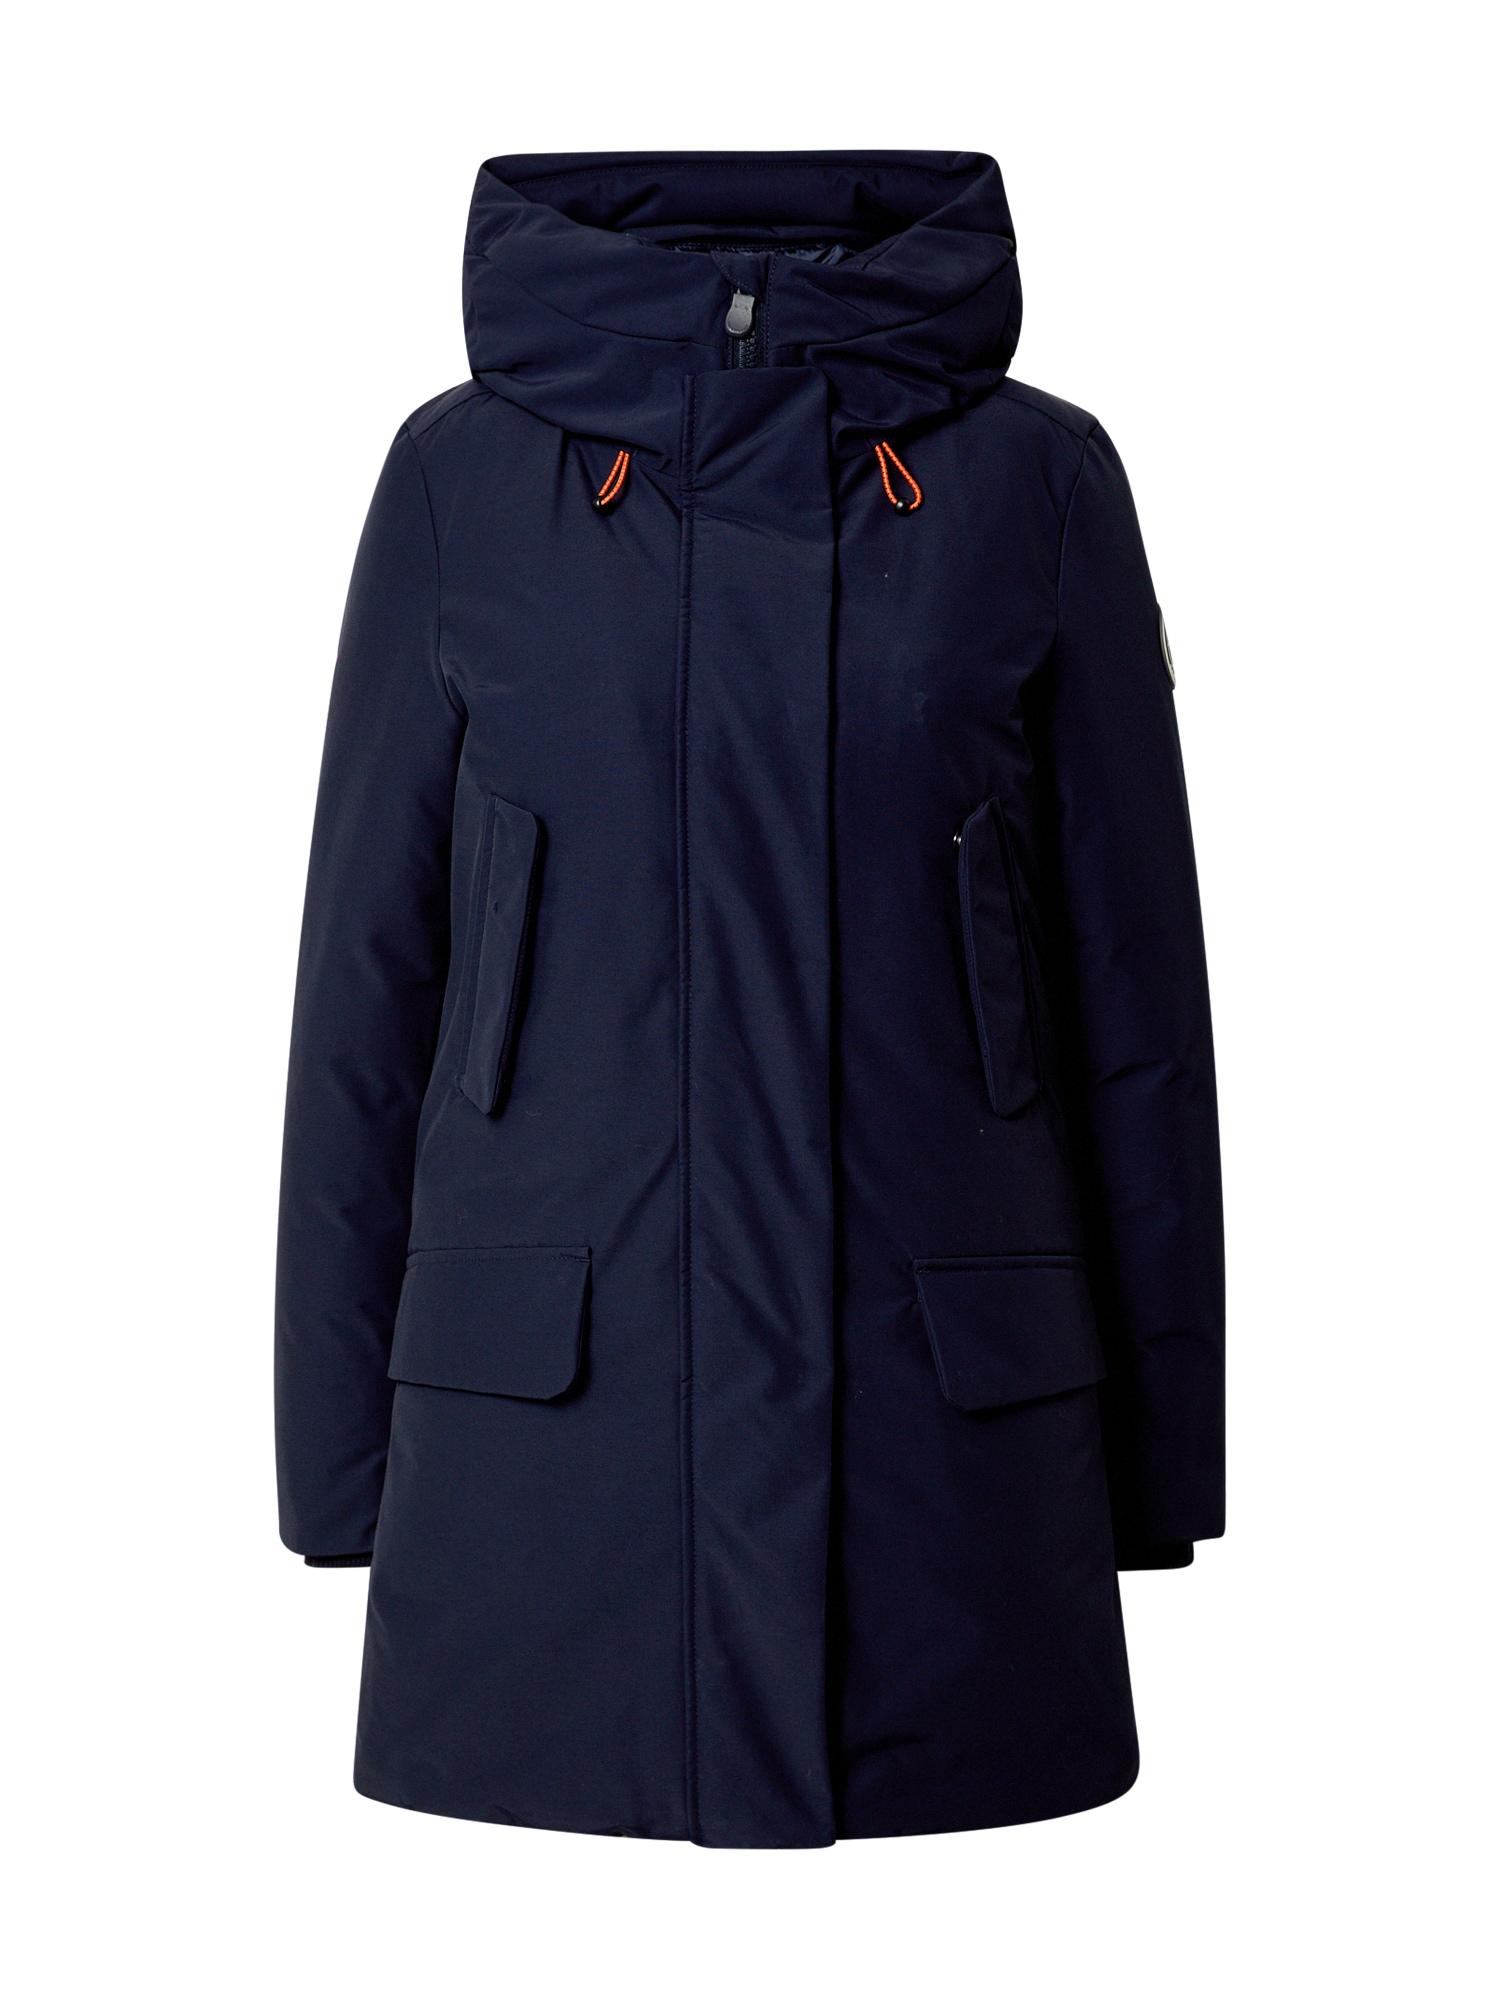 SAVE THE DUCK Zimní kabát 'Cappotto Cappuccio'  tmavě modrá